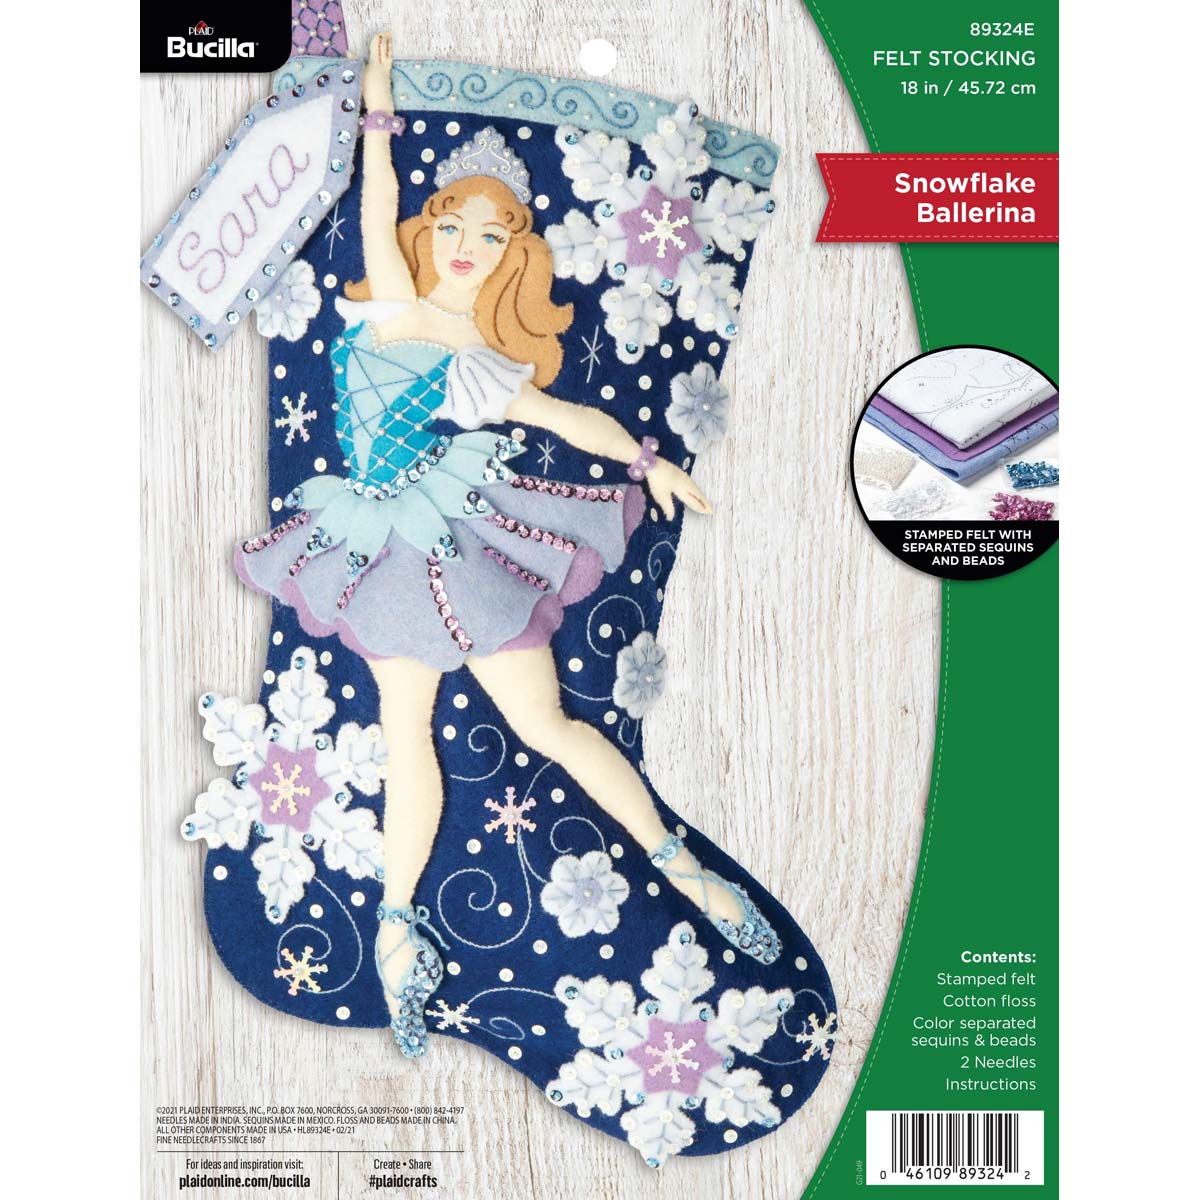 Bucilla ® Seasonal - Felt - Stocking Kits - Snowflake Ballerinia - 89324E